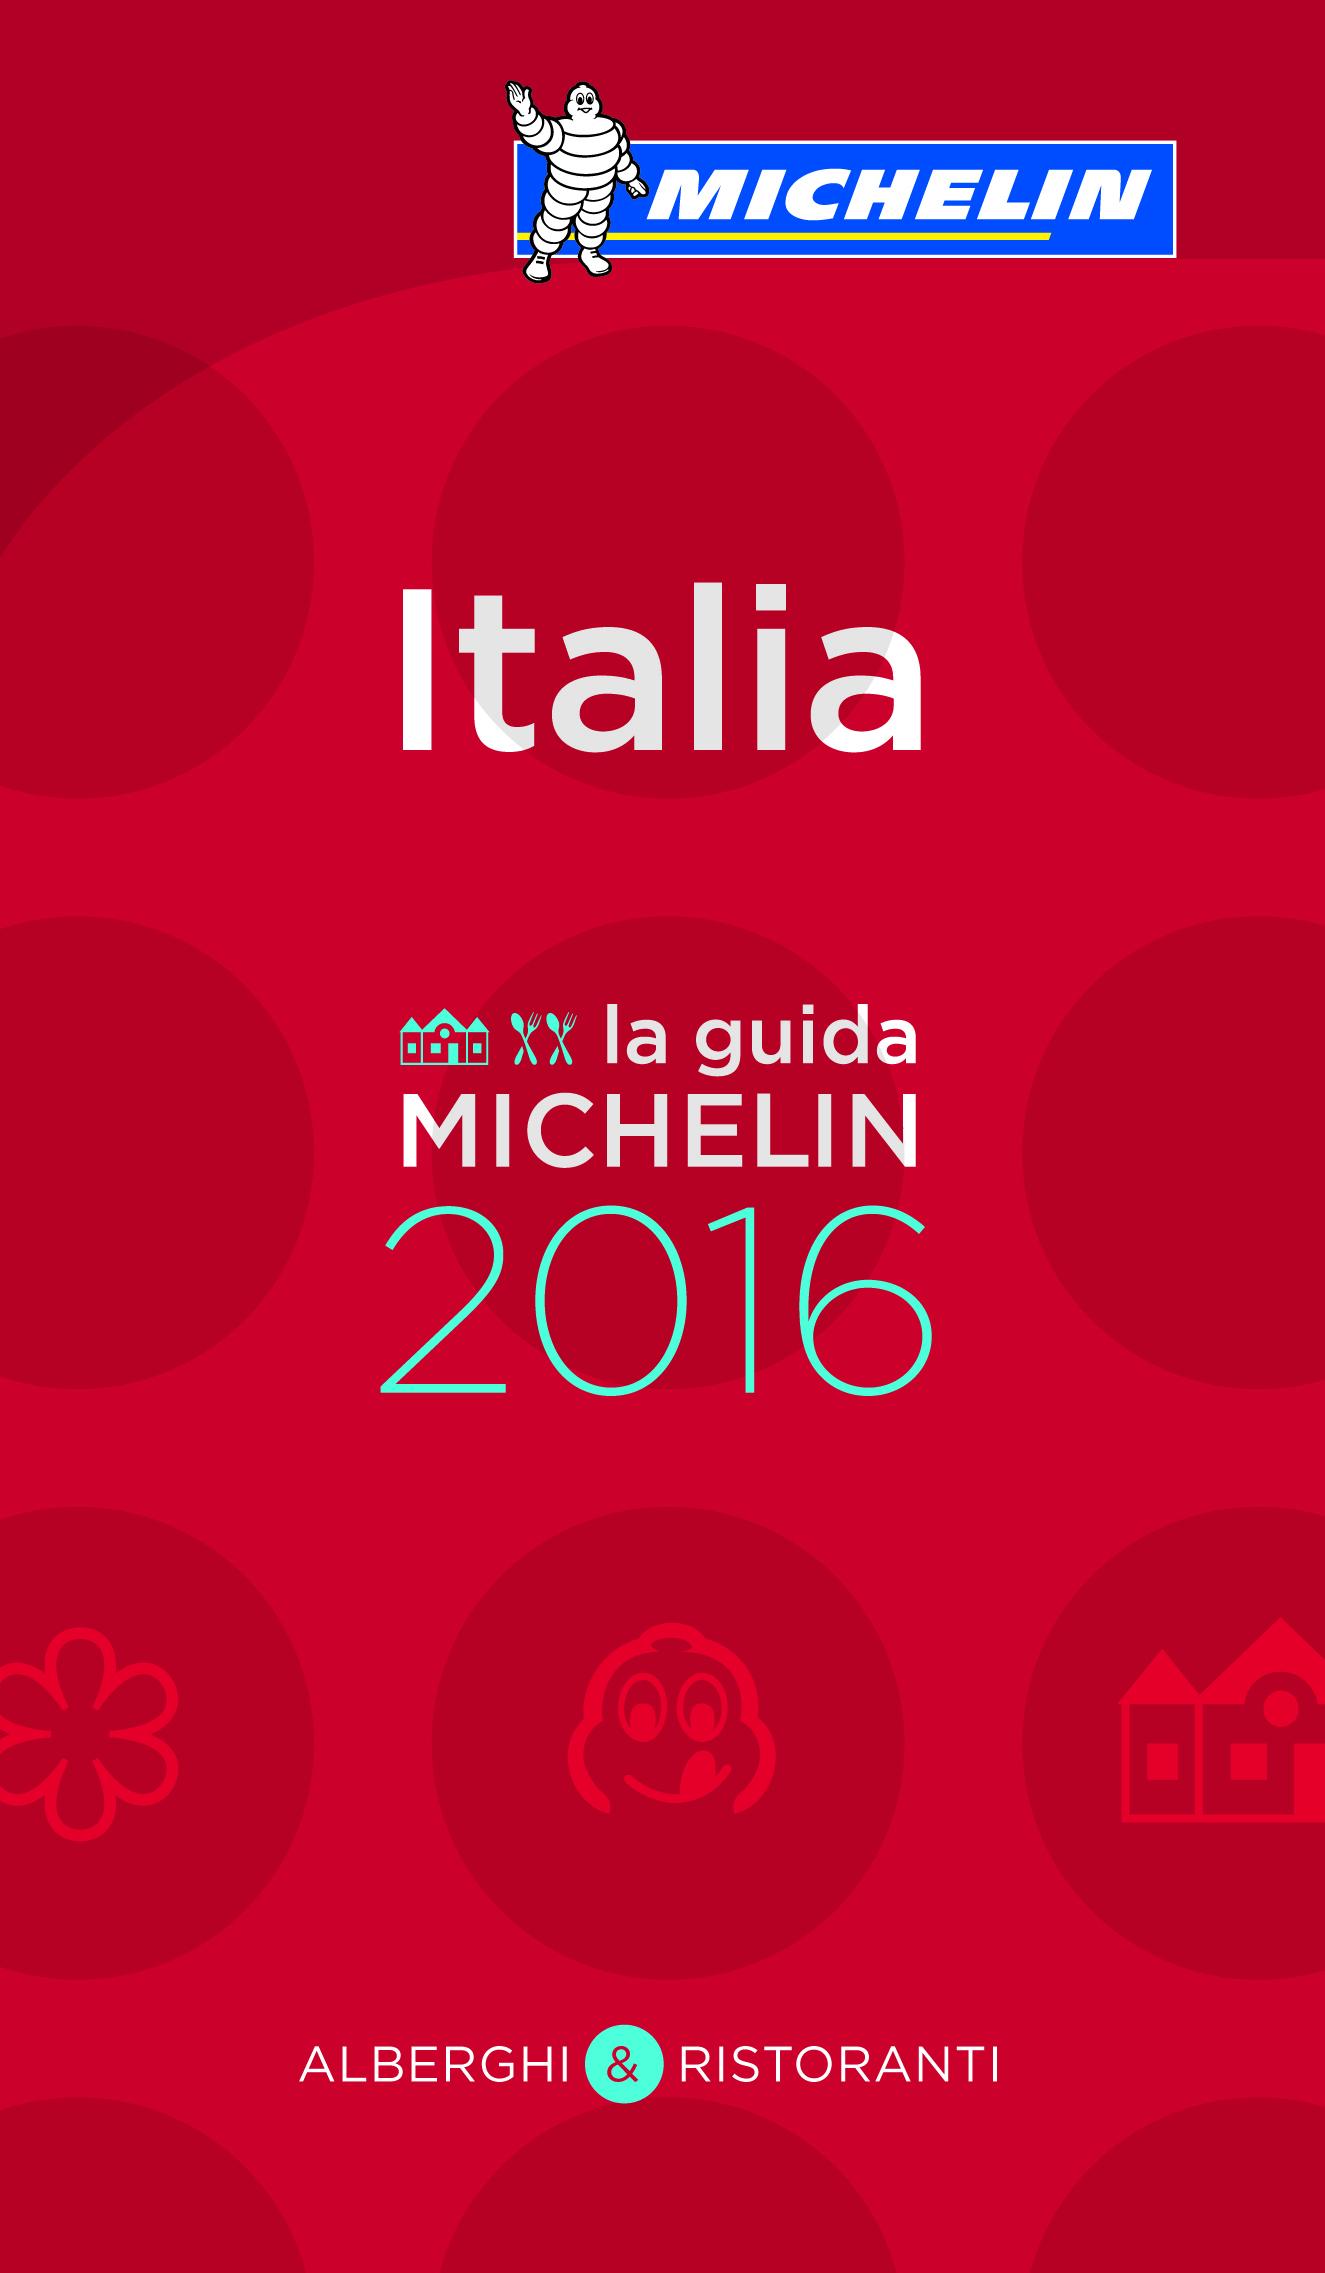 Michelin guide italy 2020 selection vendôm.